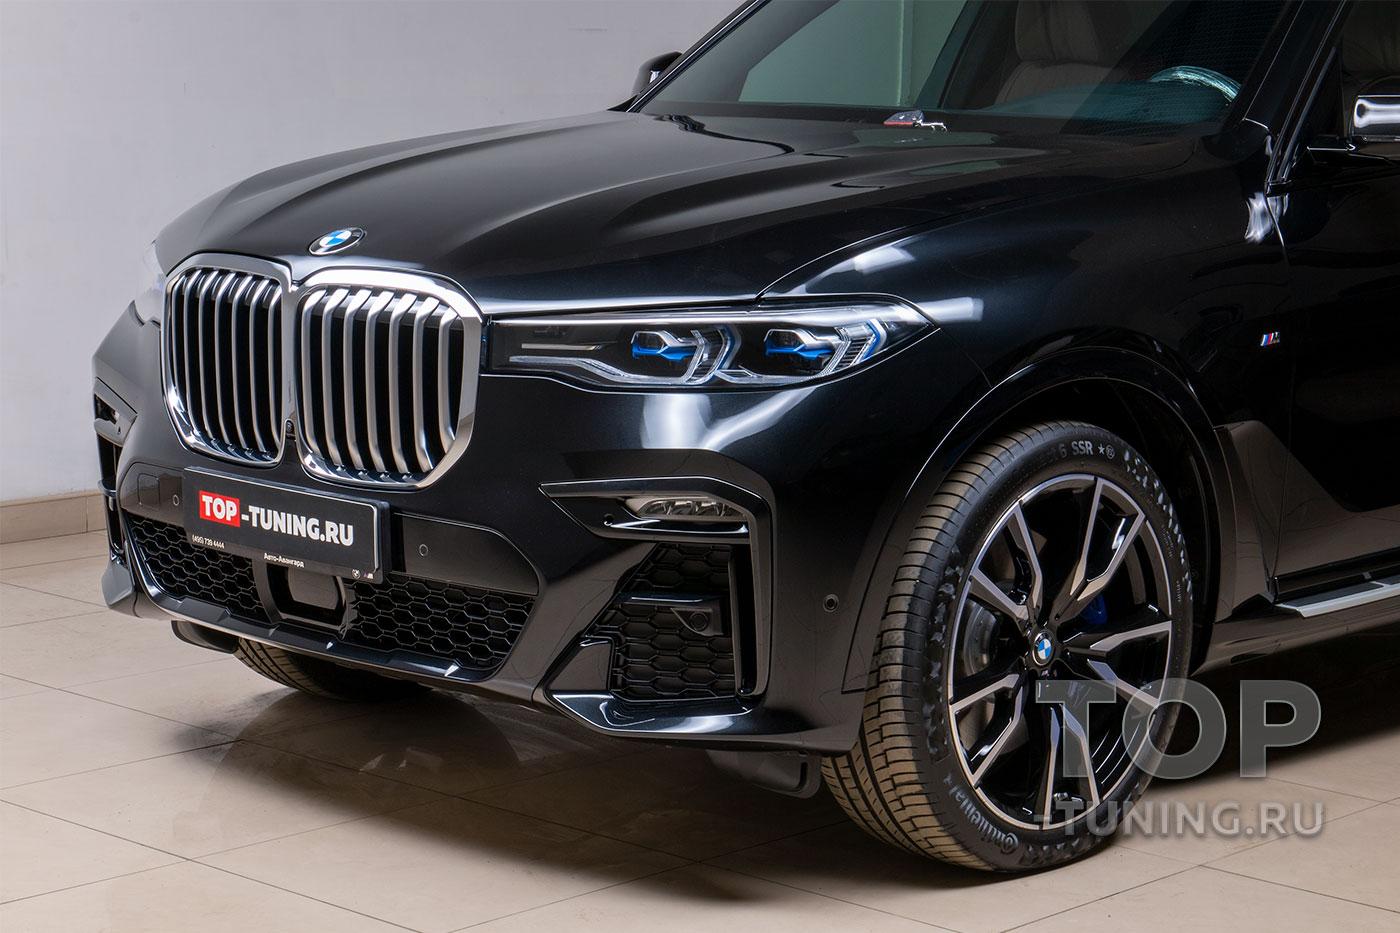 103435 Готовим BMW X7 - пленка, керамика, тонировка, салон, аксессуары